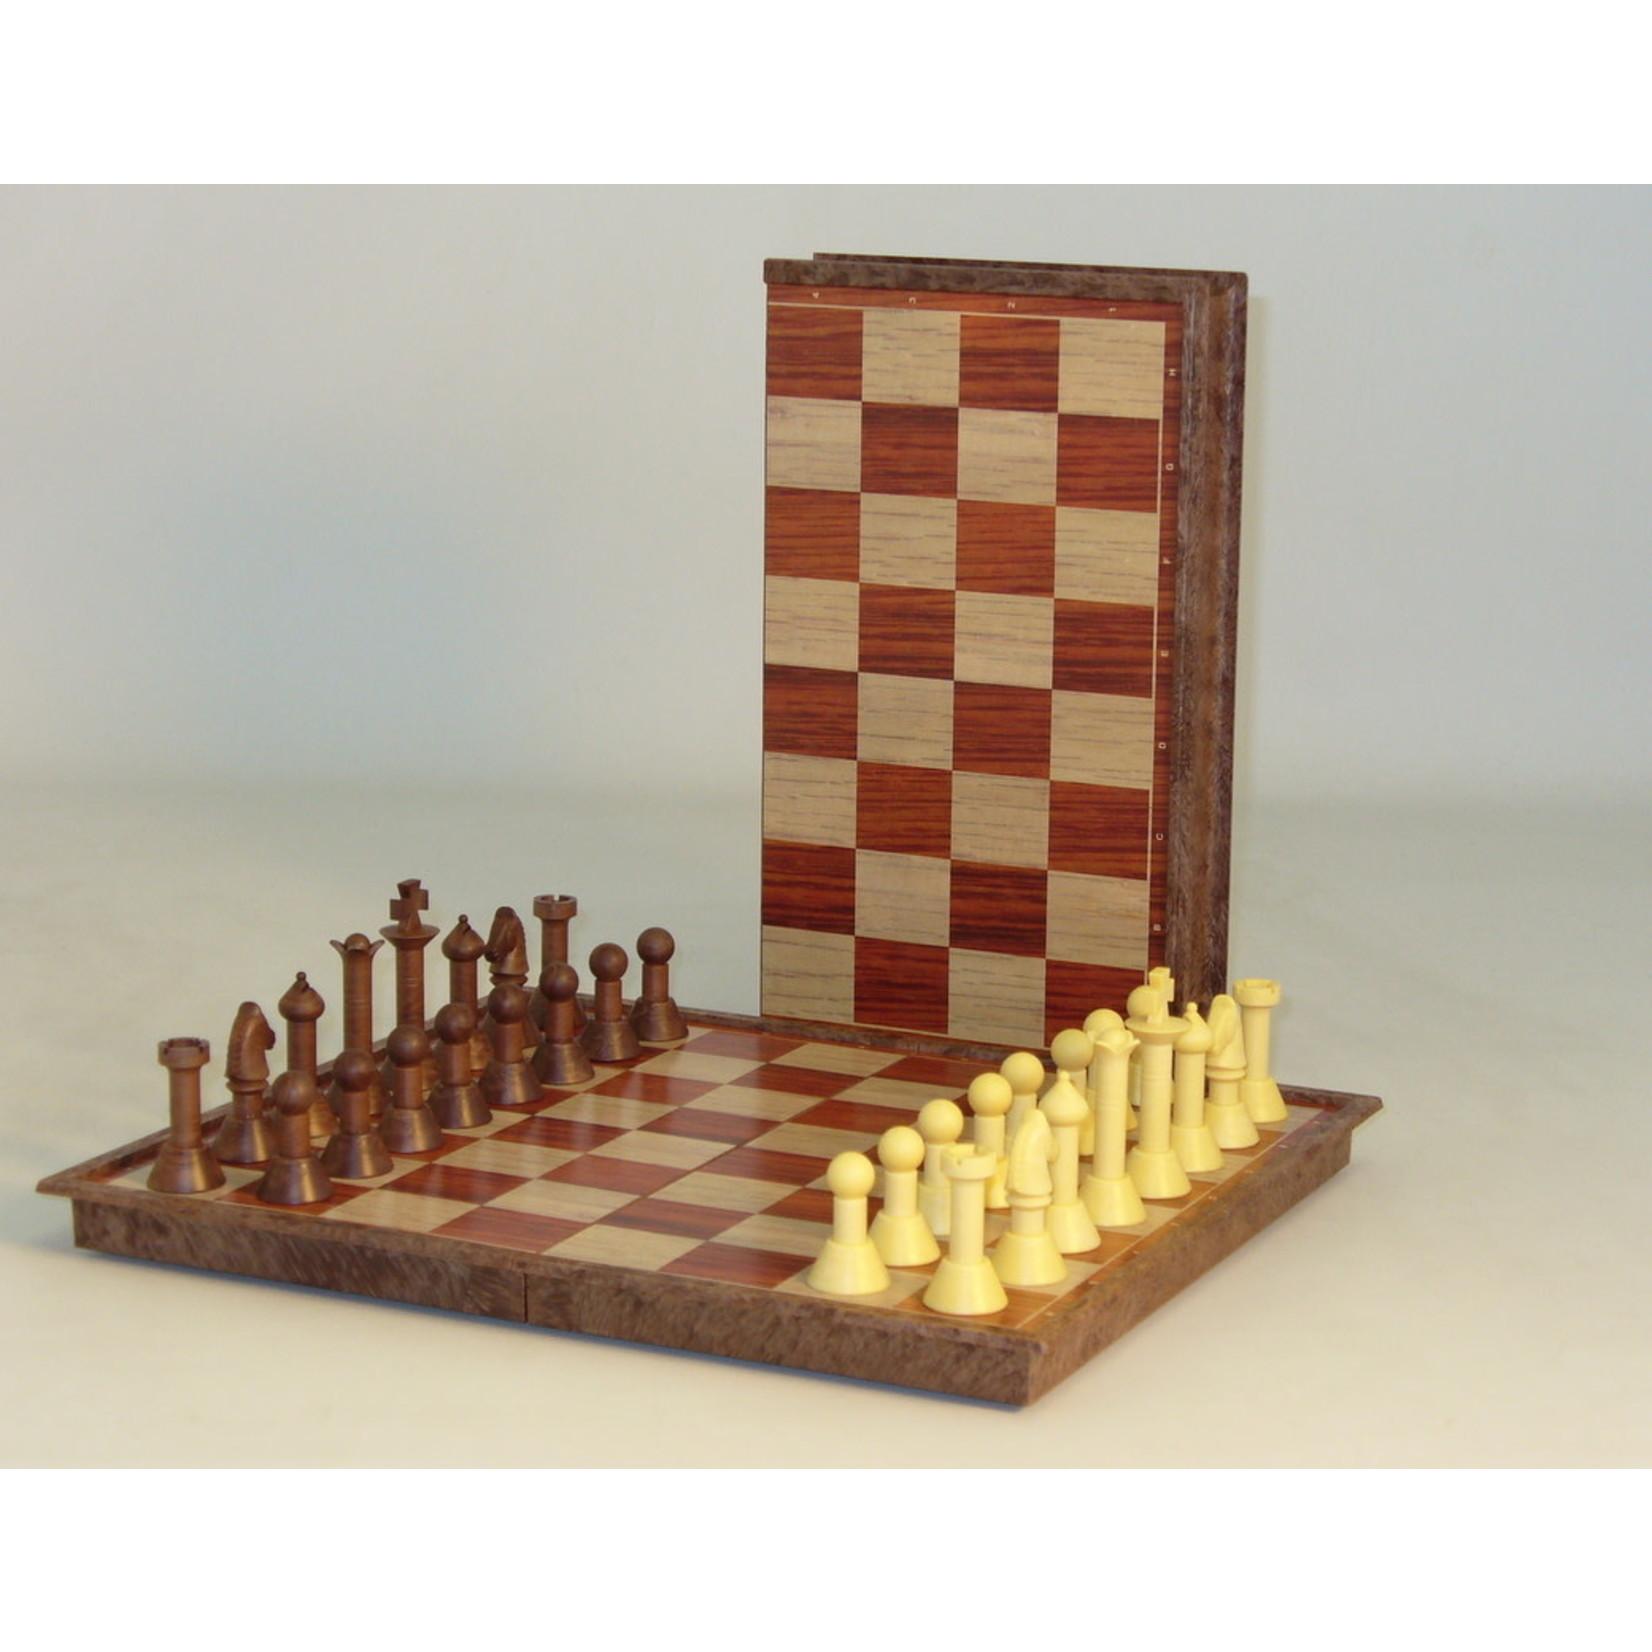 WorldWise Imports Folding Woody Magnetic Chess Set - 11' board